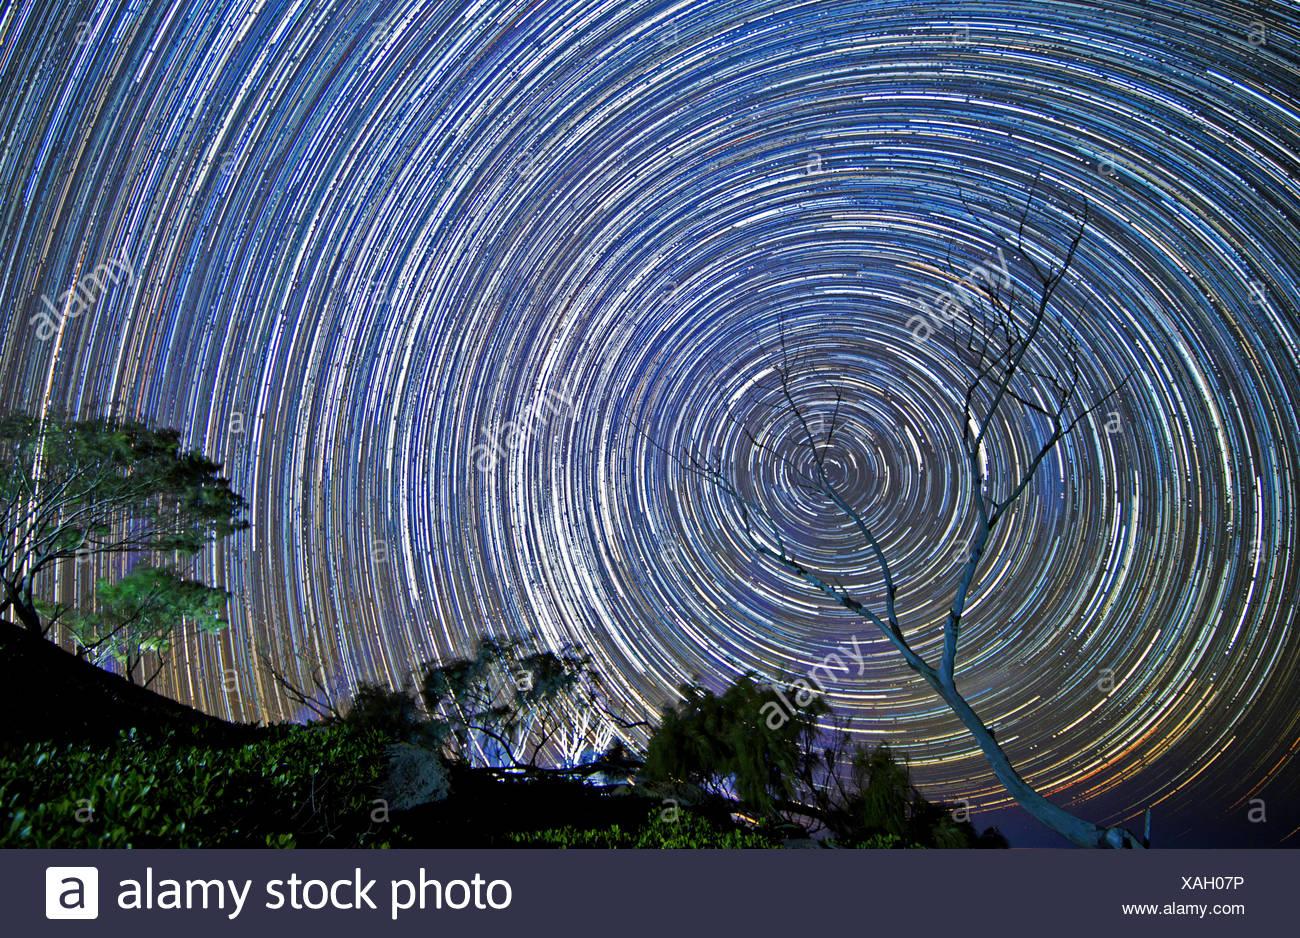 Stars at night - Stock Image